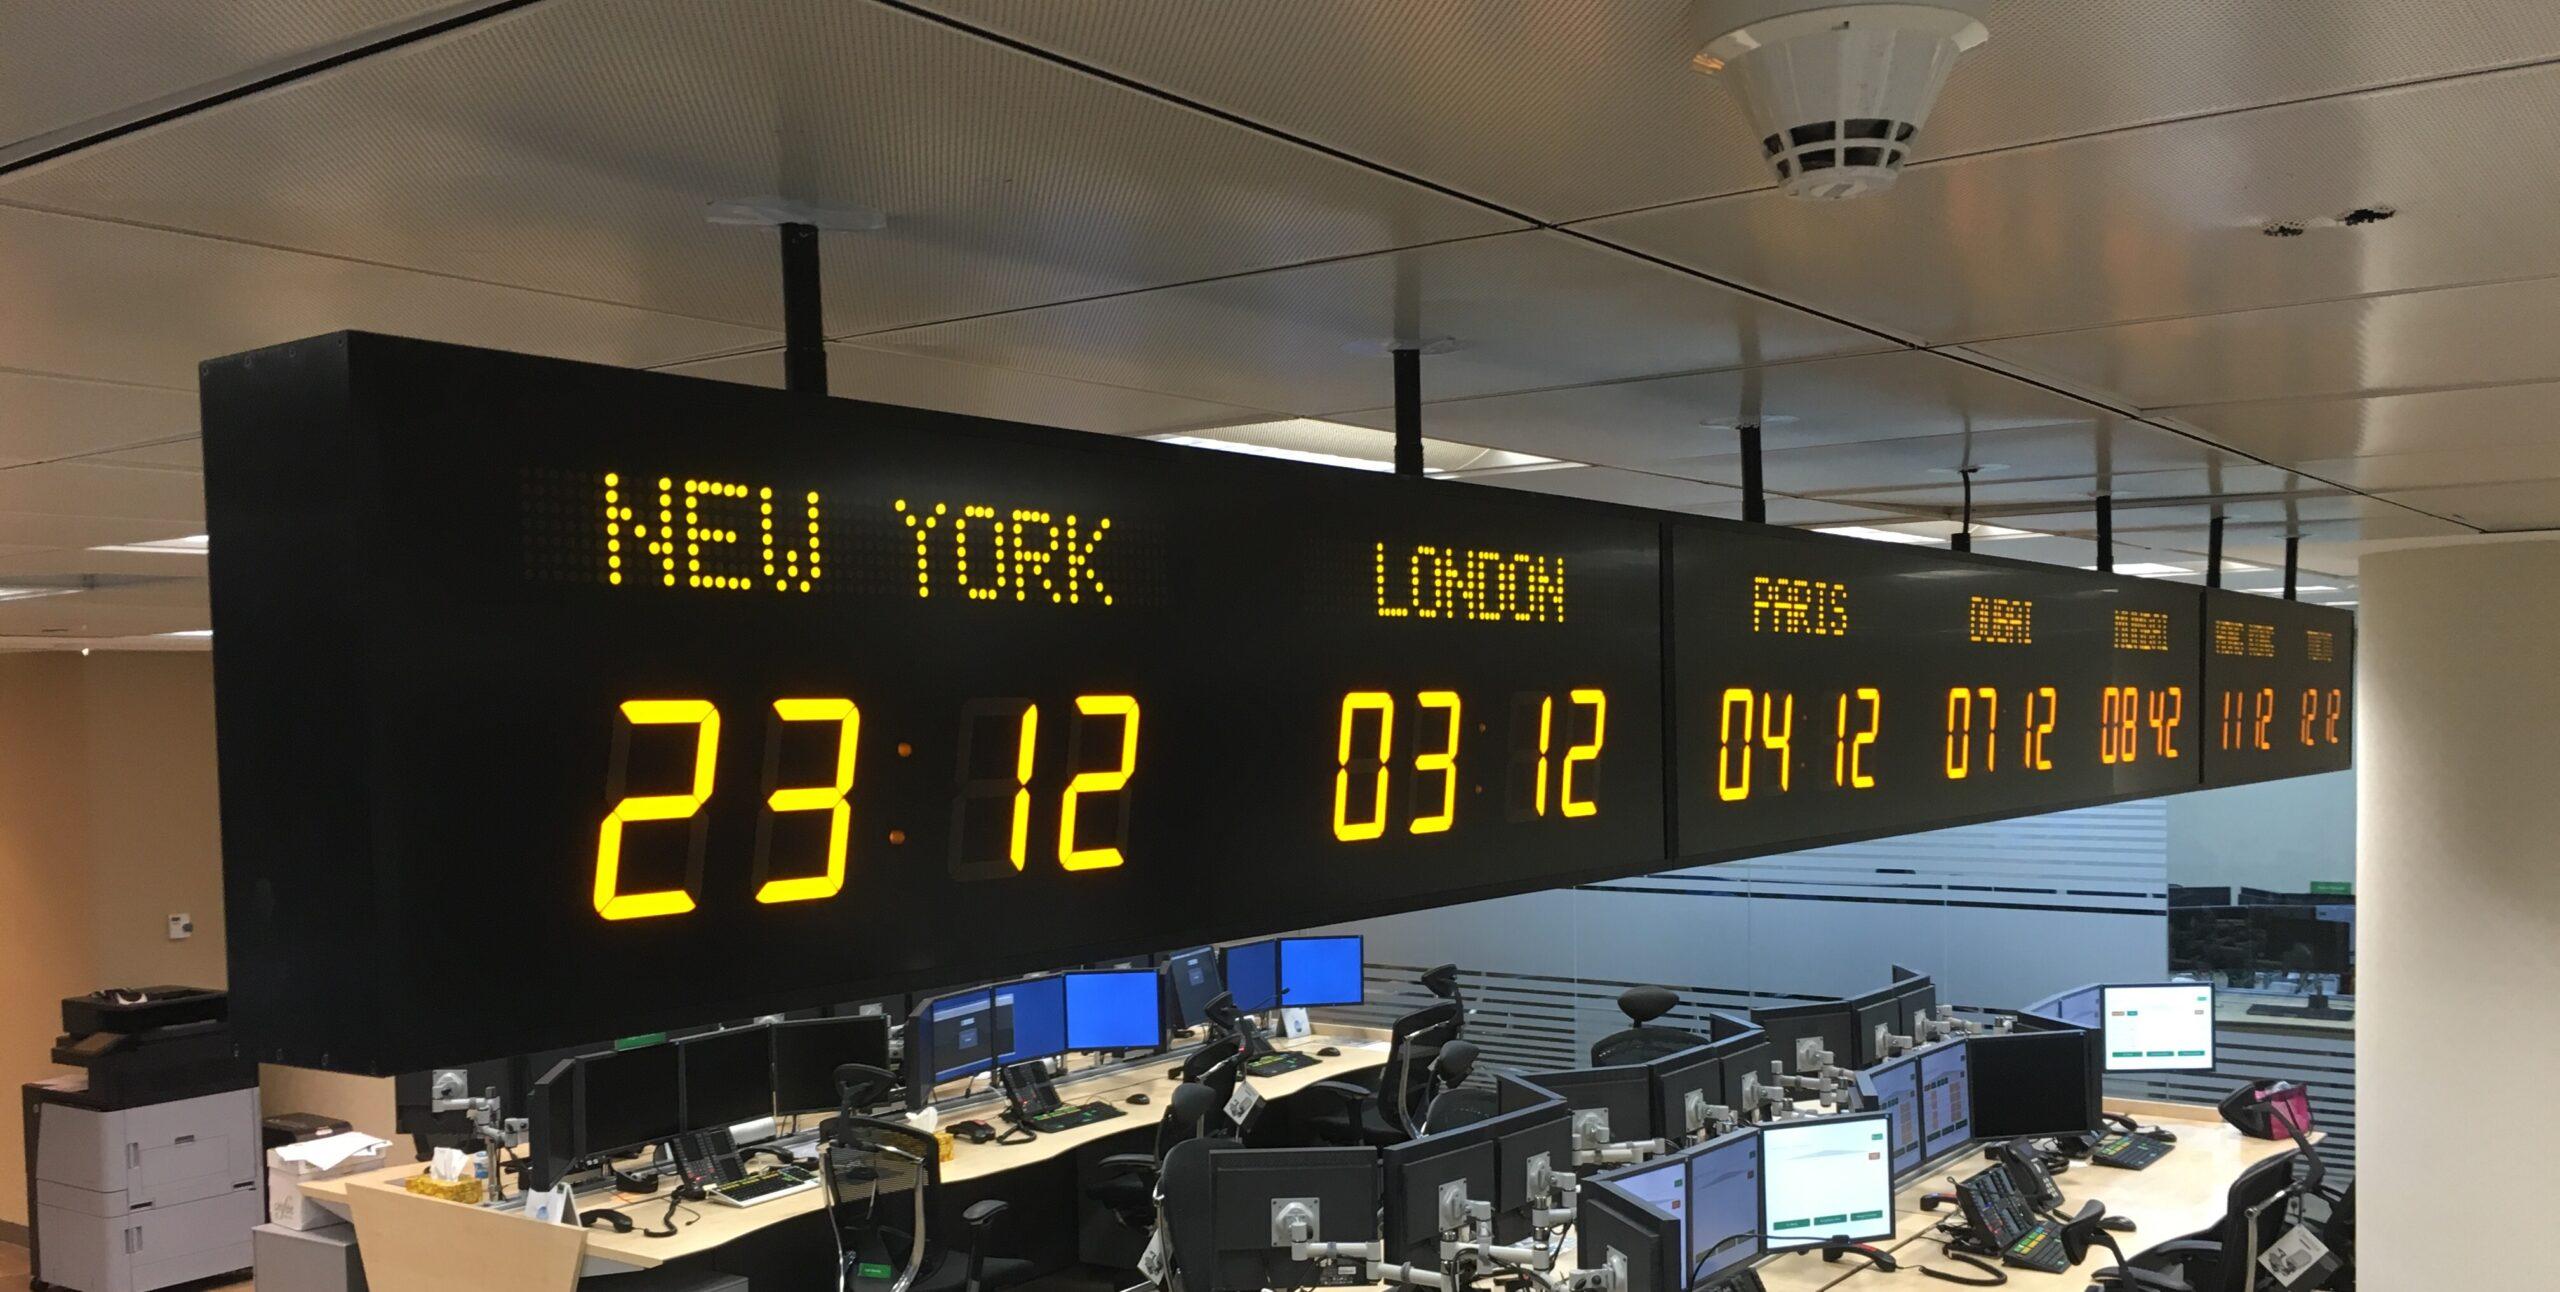 Digital Clocks21